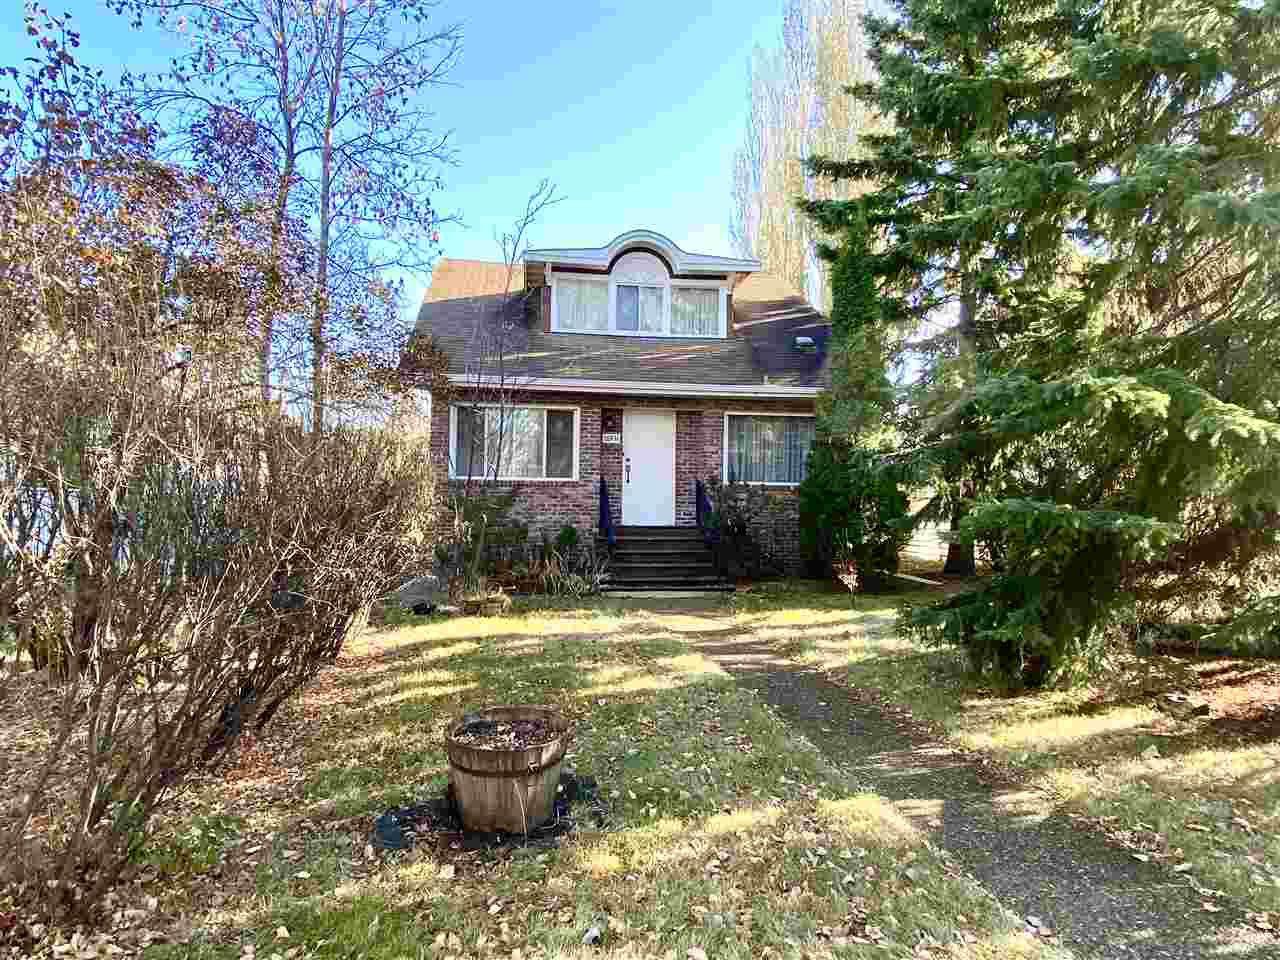 Main Photo: 10931 81 Street in Edmonton: Zone 09 House for sale : MLS®# E4220831